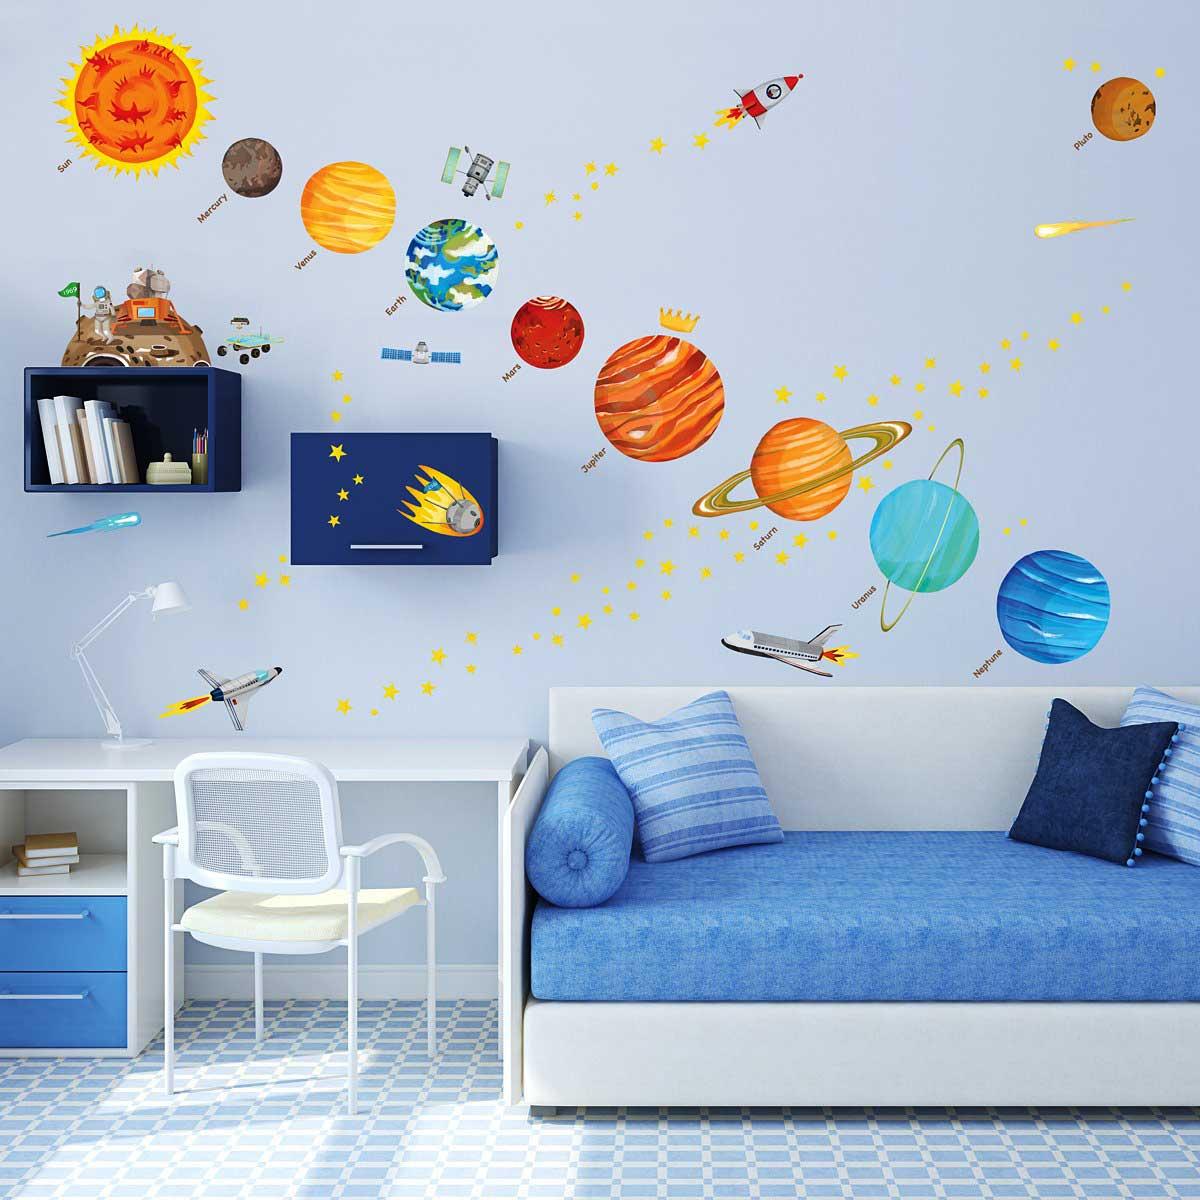 Wandsticker planeten sonnensystem weltraum wandsticker kinderzimmer - Wandsticker jugendzimmer ...